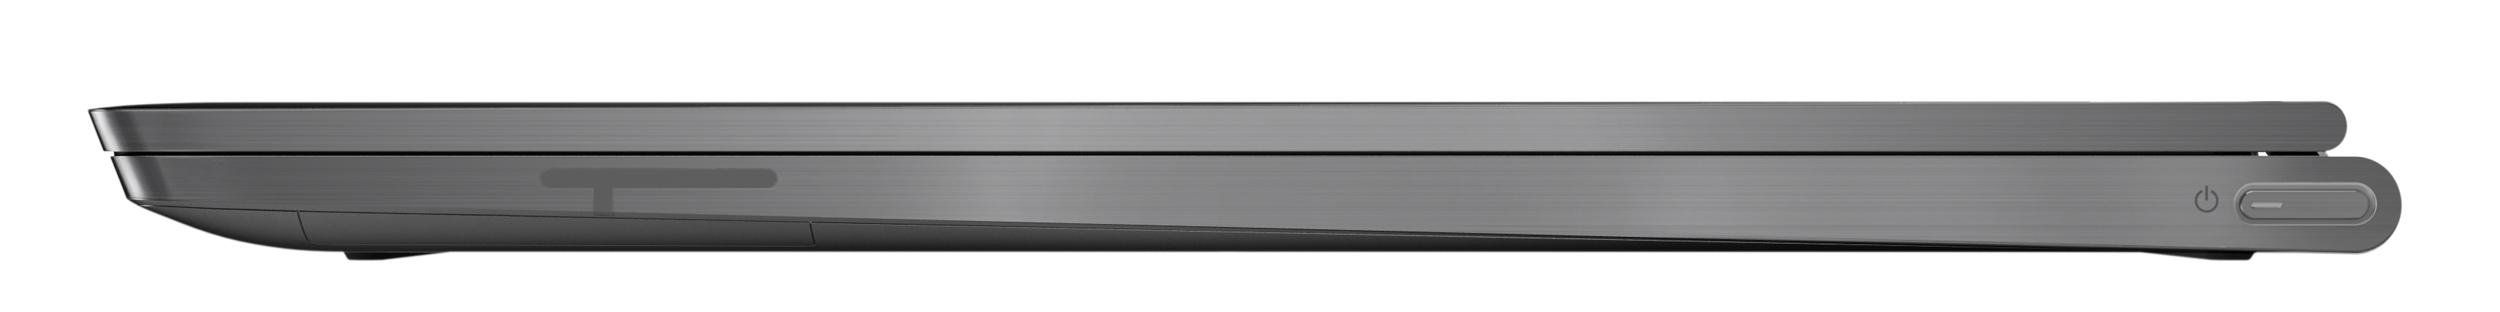 Фото  Ультрабук Lenovo Yoga C930 (81C400LJRA)